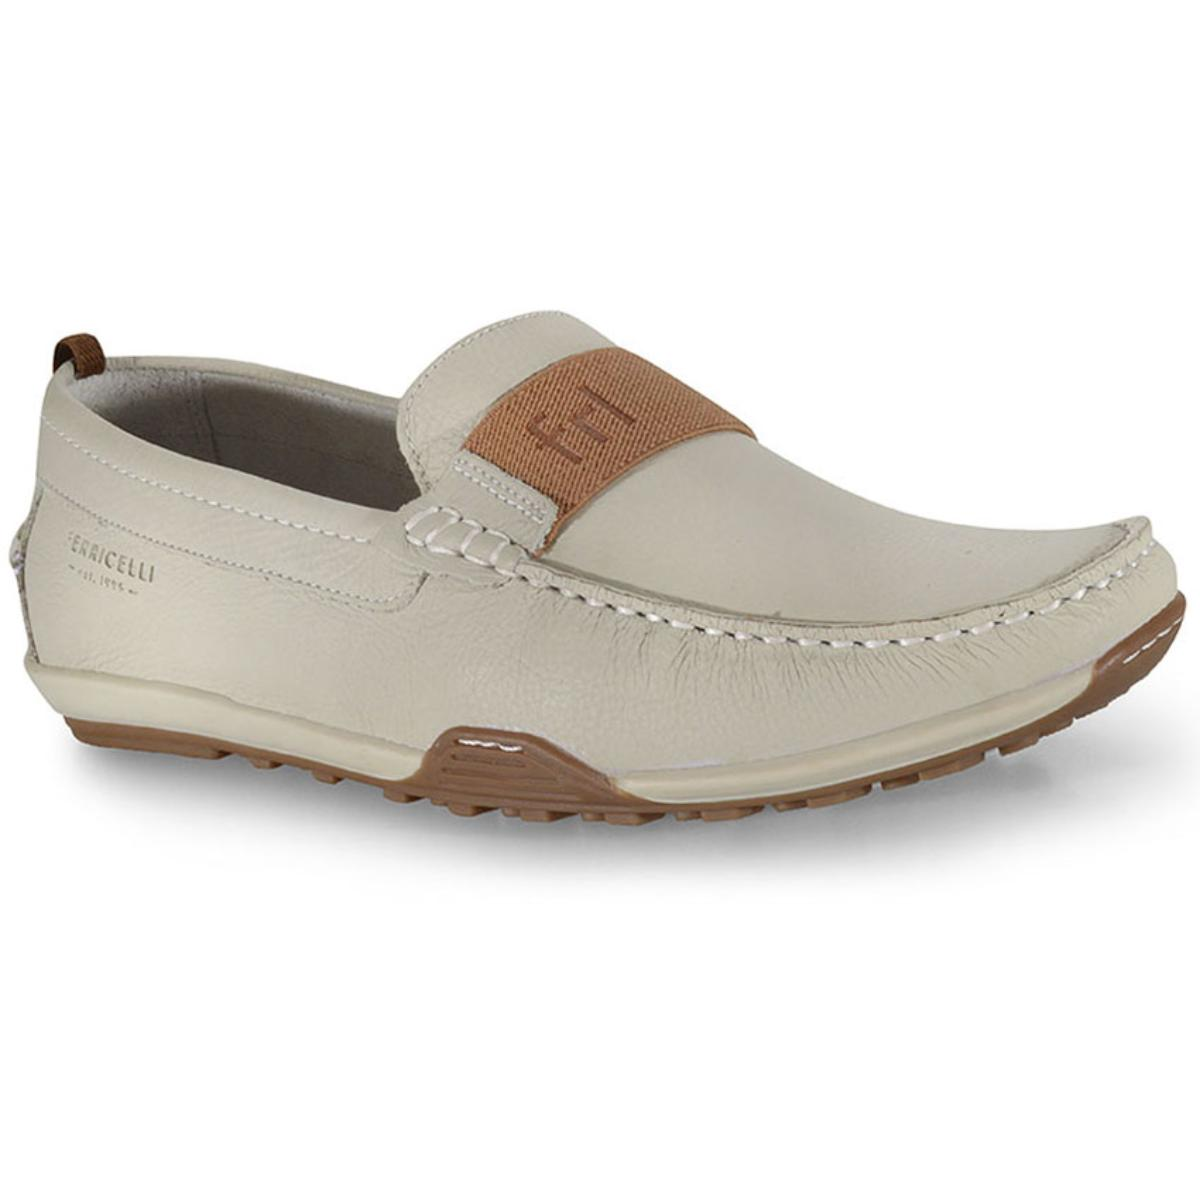 Sapato Masculino Ferricelli Mca54800 Off White/castanho